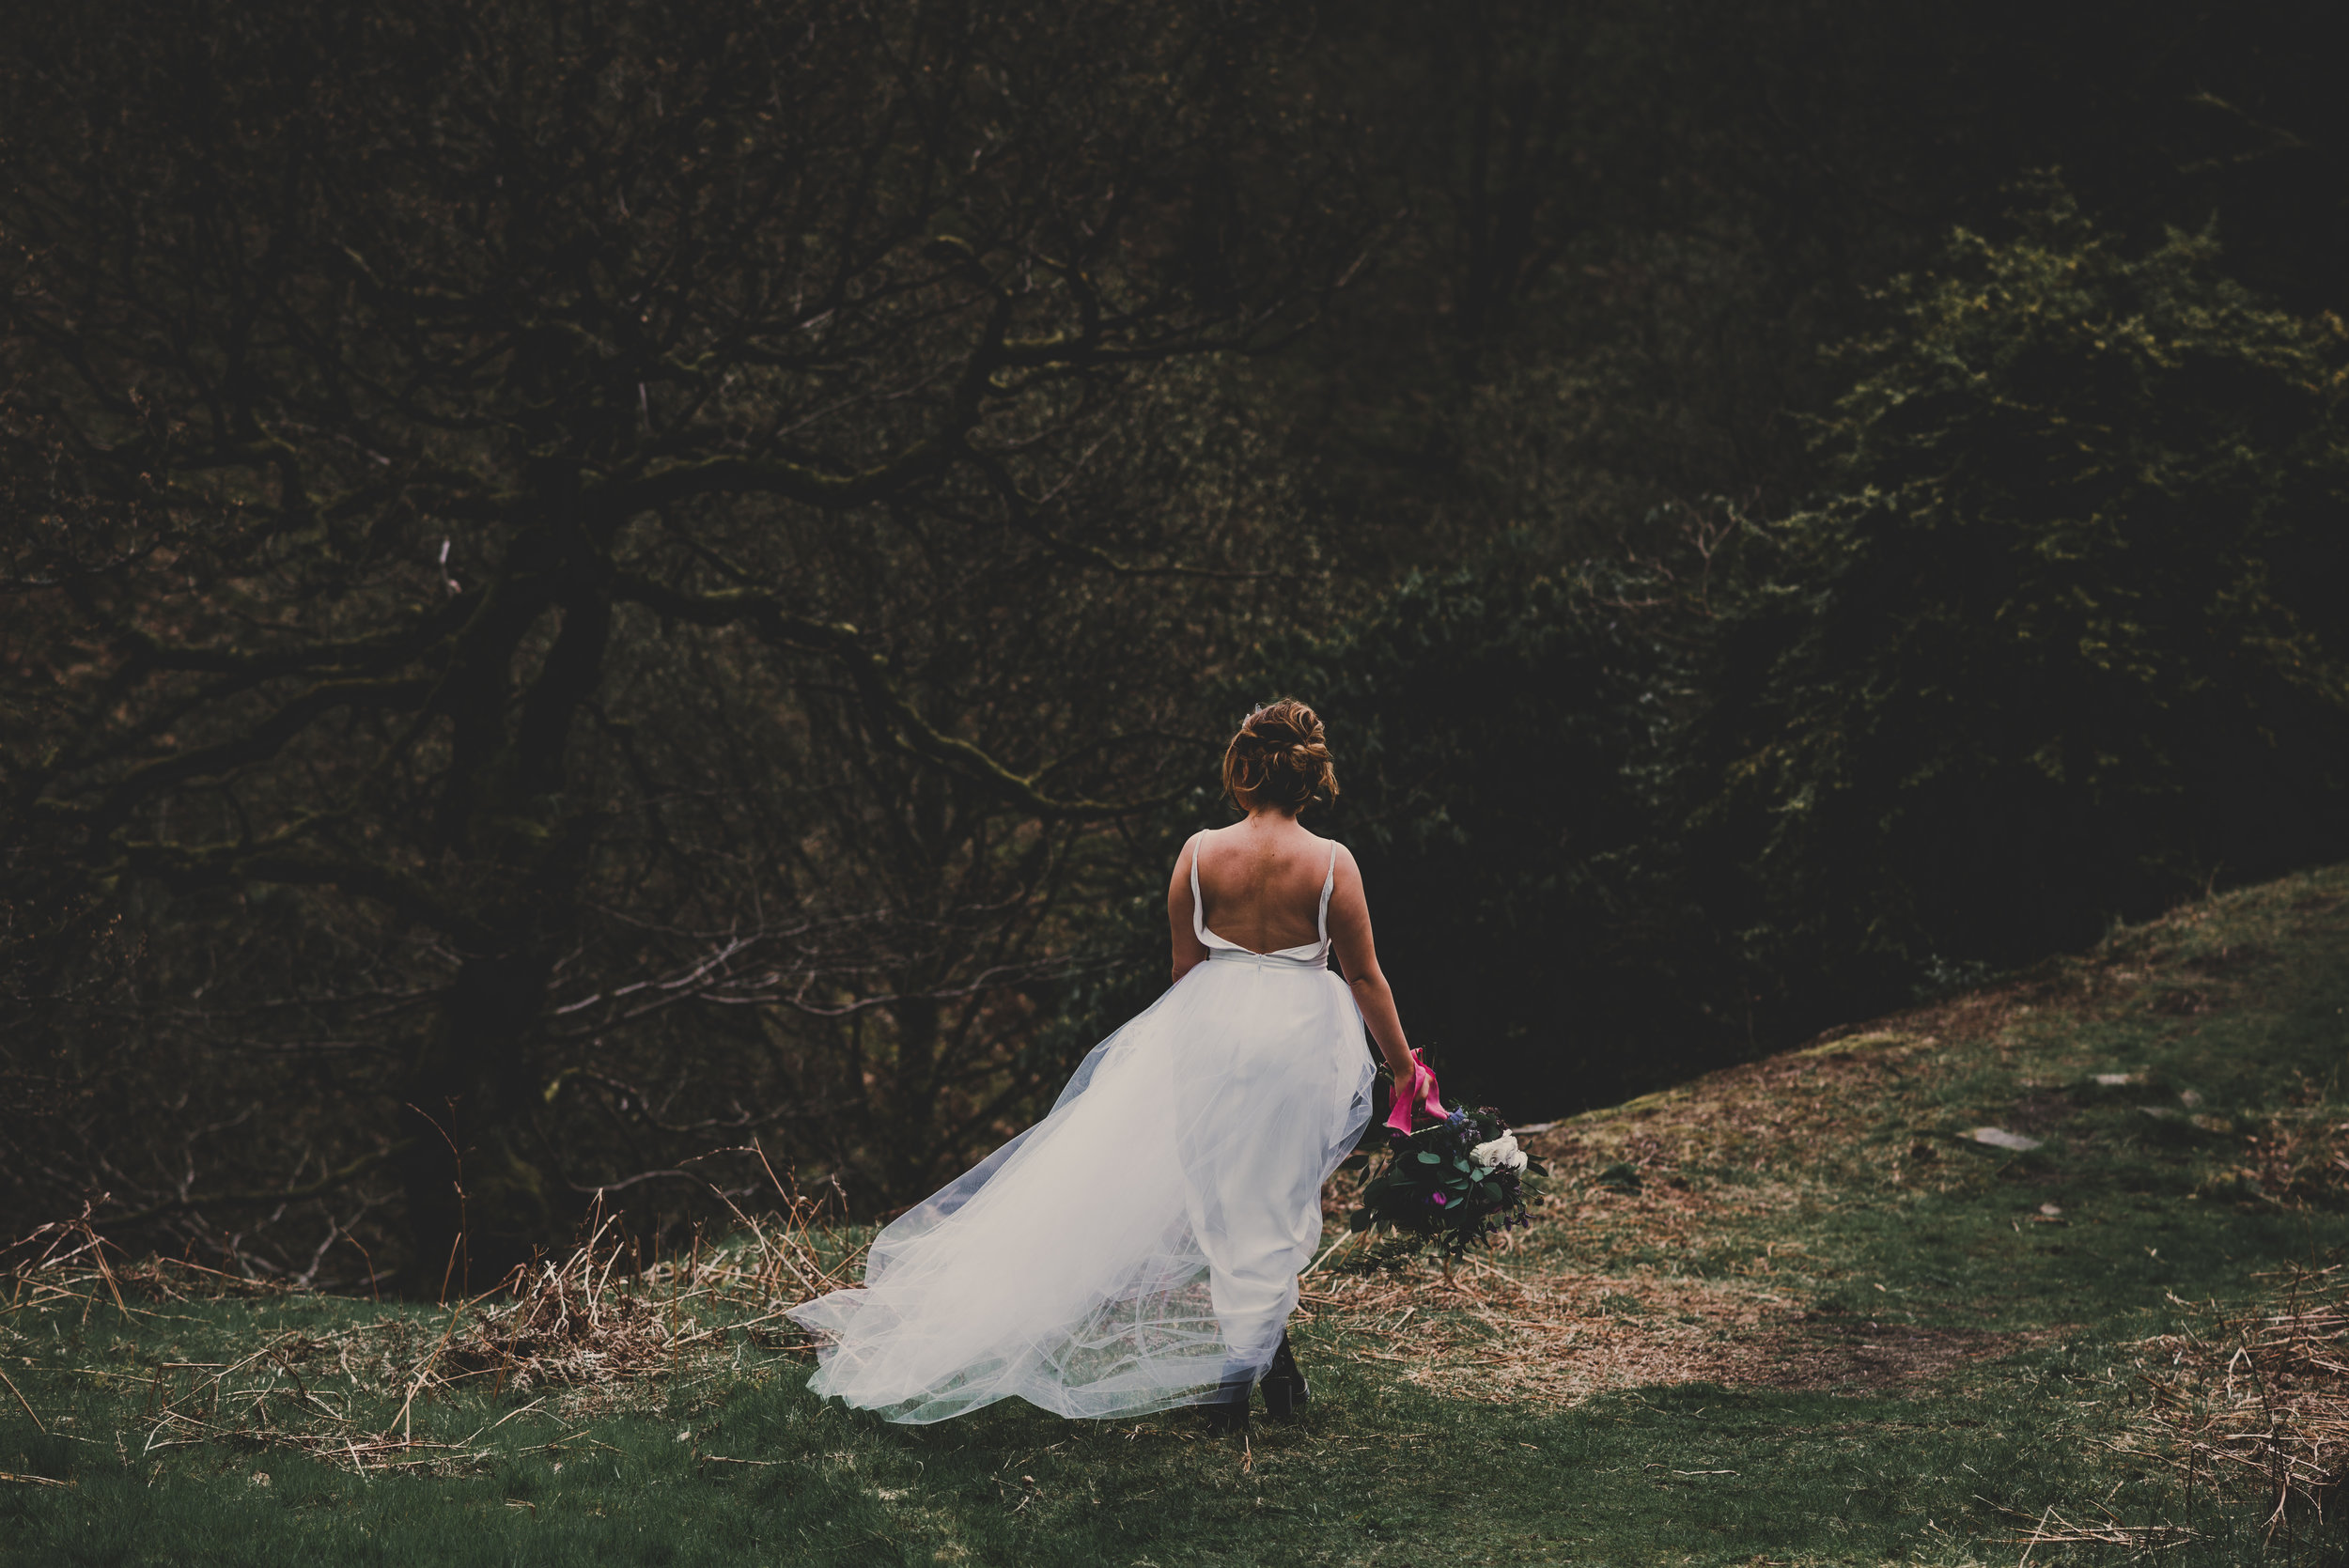 jade maguire photography wild wedding photography (10).jpg